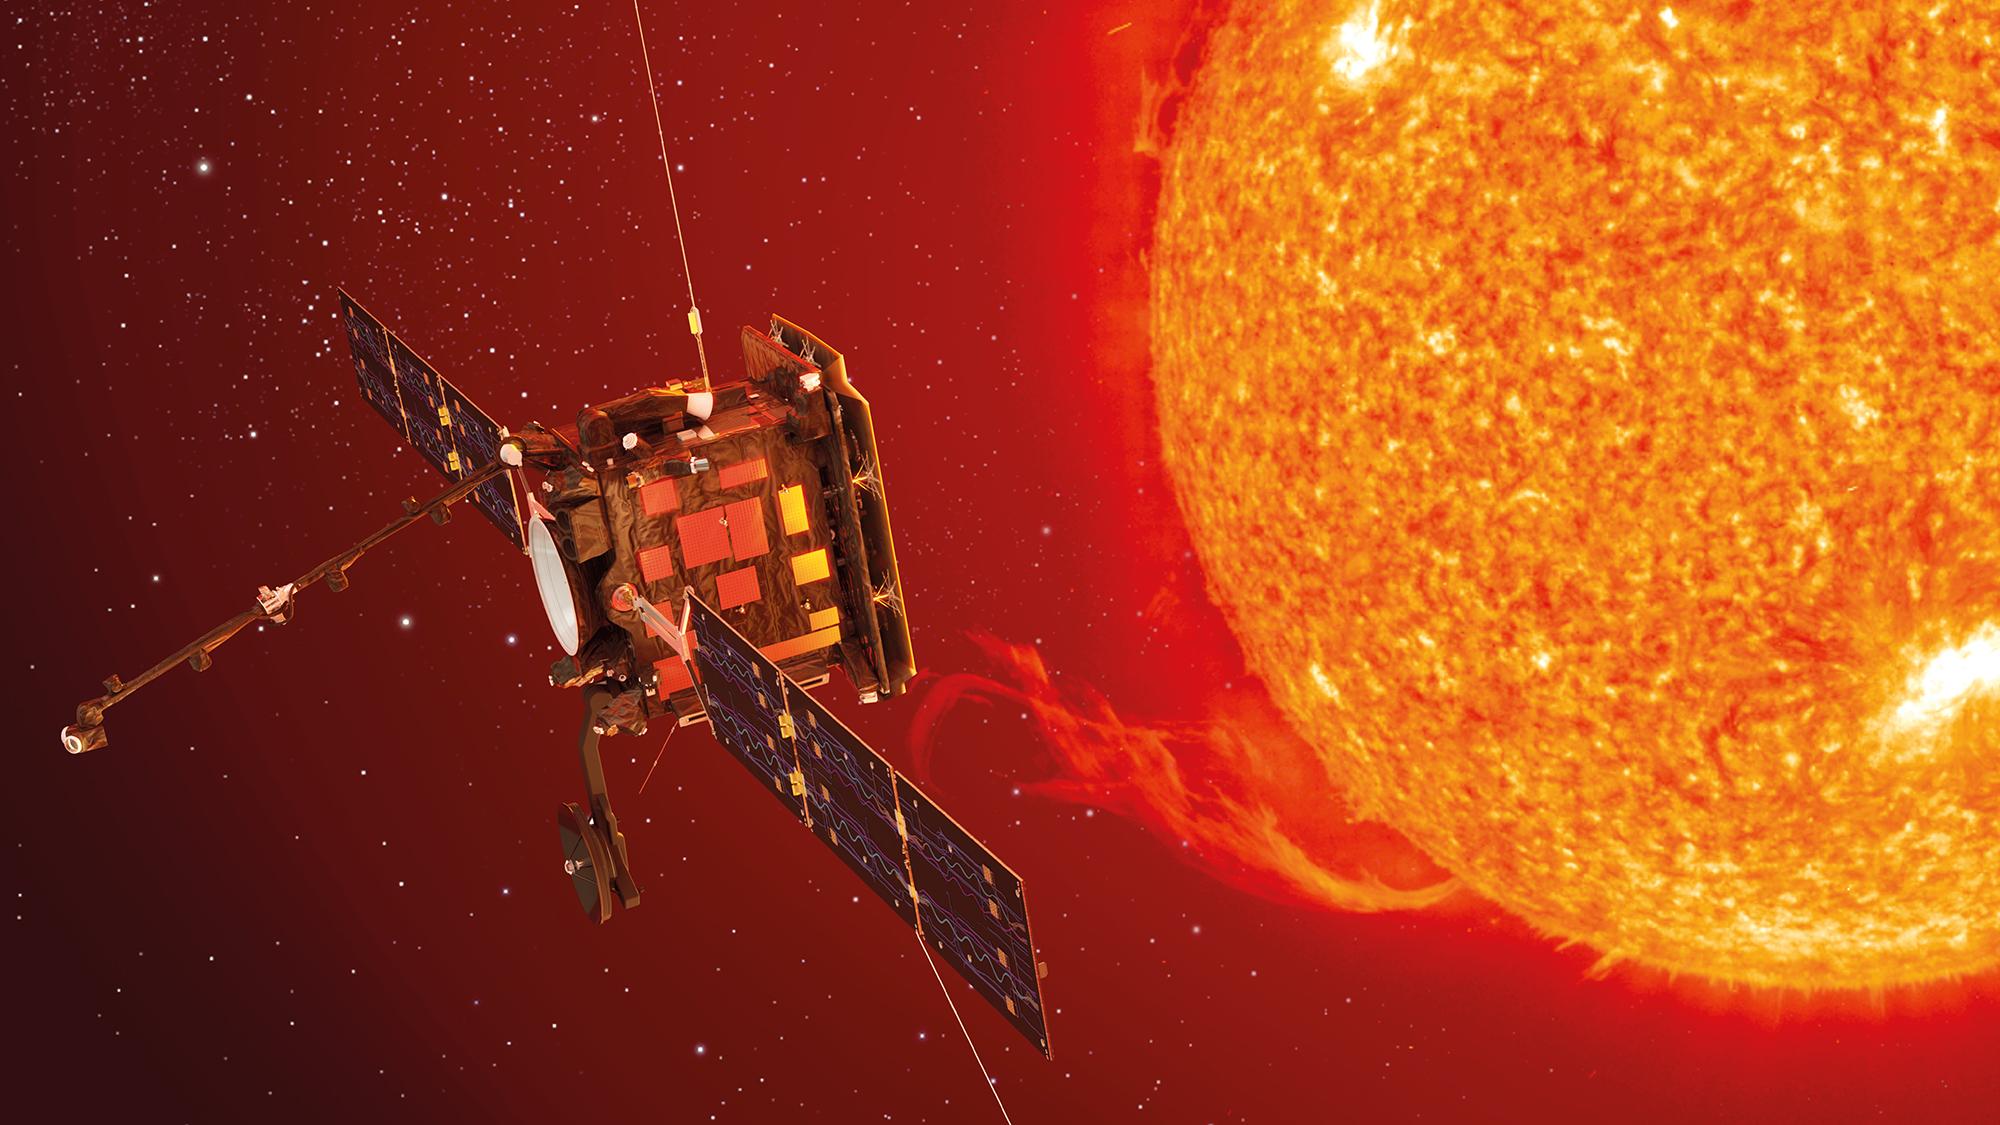 1567216088069-SolarOrbiter_spacecraft_illustration_2000.jpg